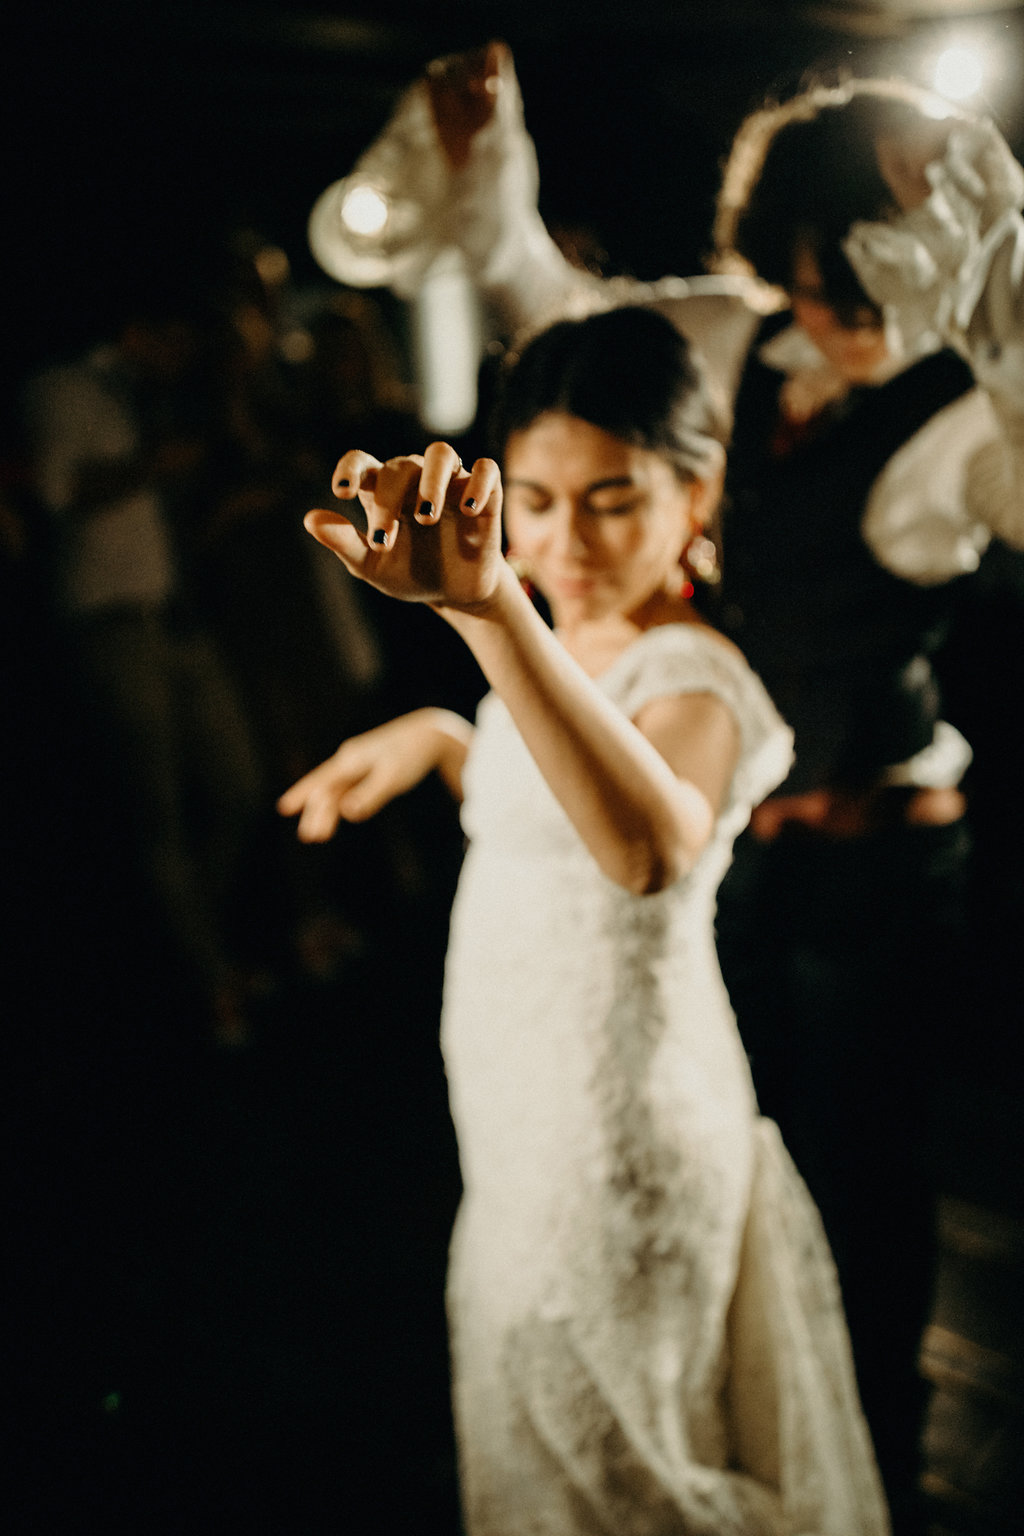 427-sjoerdbooijphotography-wedding-coen-janaina.jpg